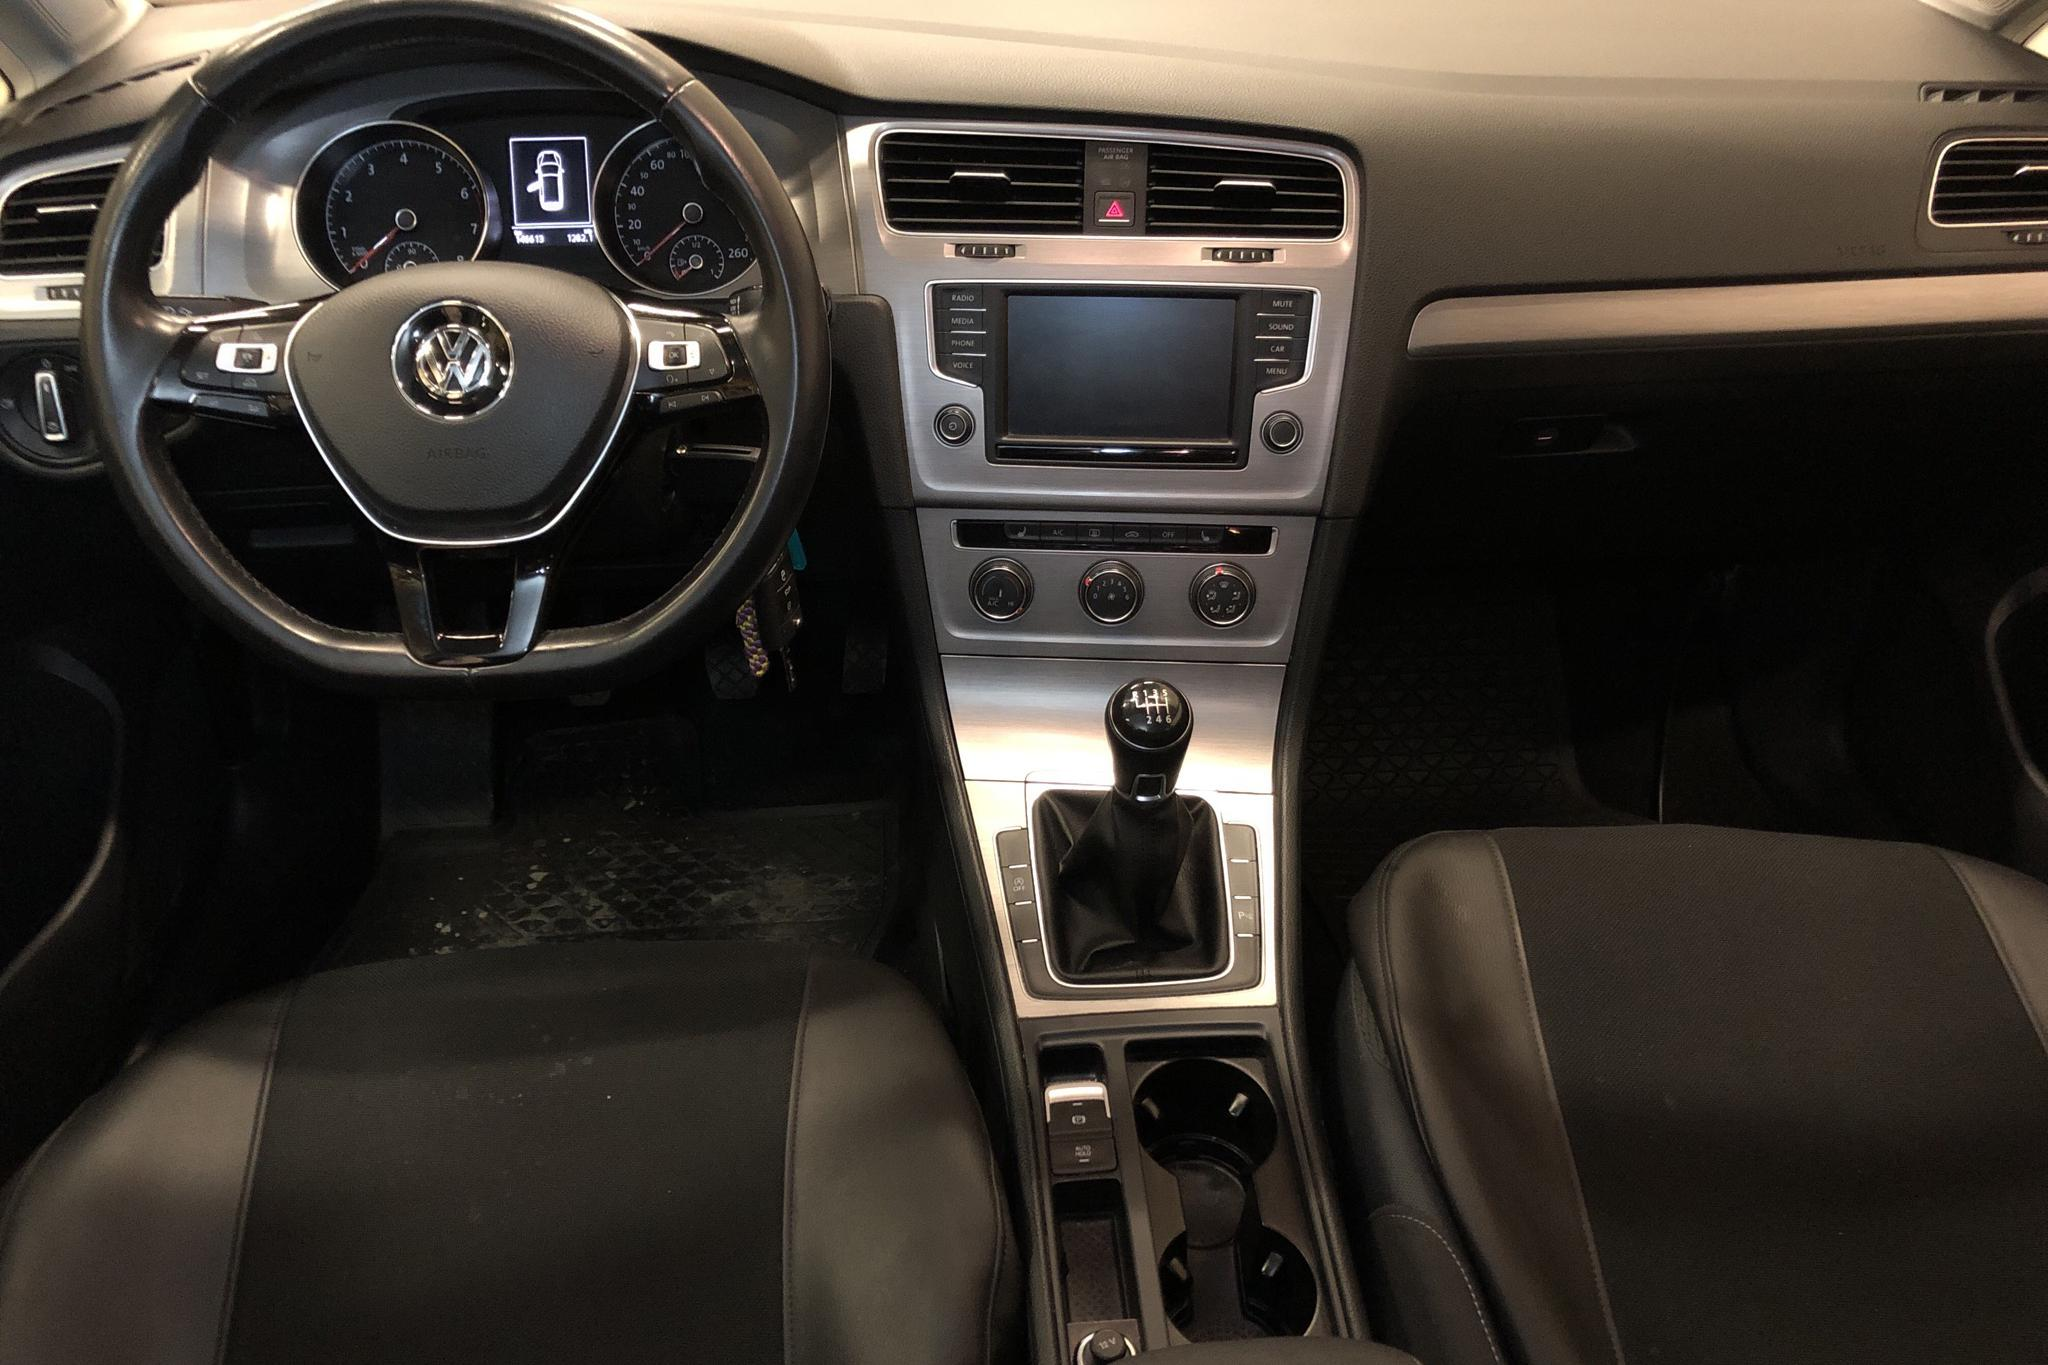 VW Golf VII 1.4 TSI Multifuel Sportscombi (125hk) - 146 620 km - Manual - white - 2016